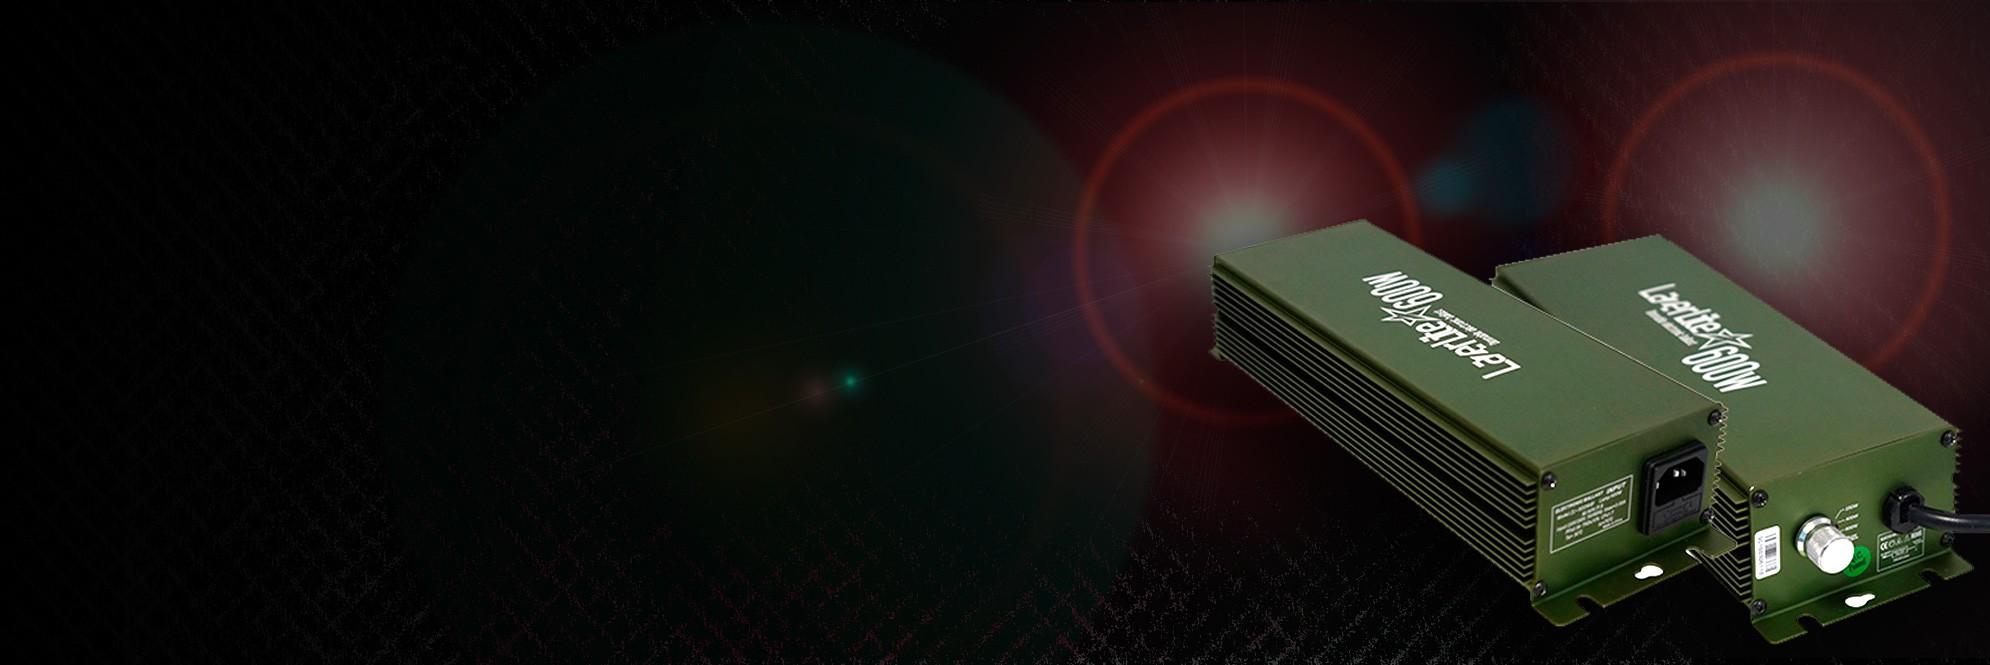 Balastro Electronico Lazerlite 600w